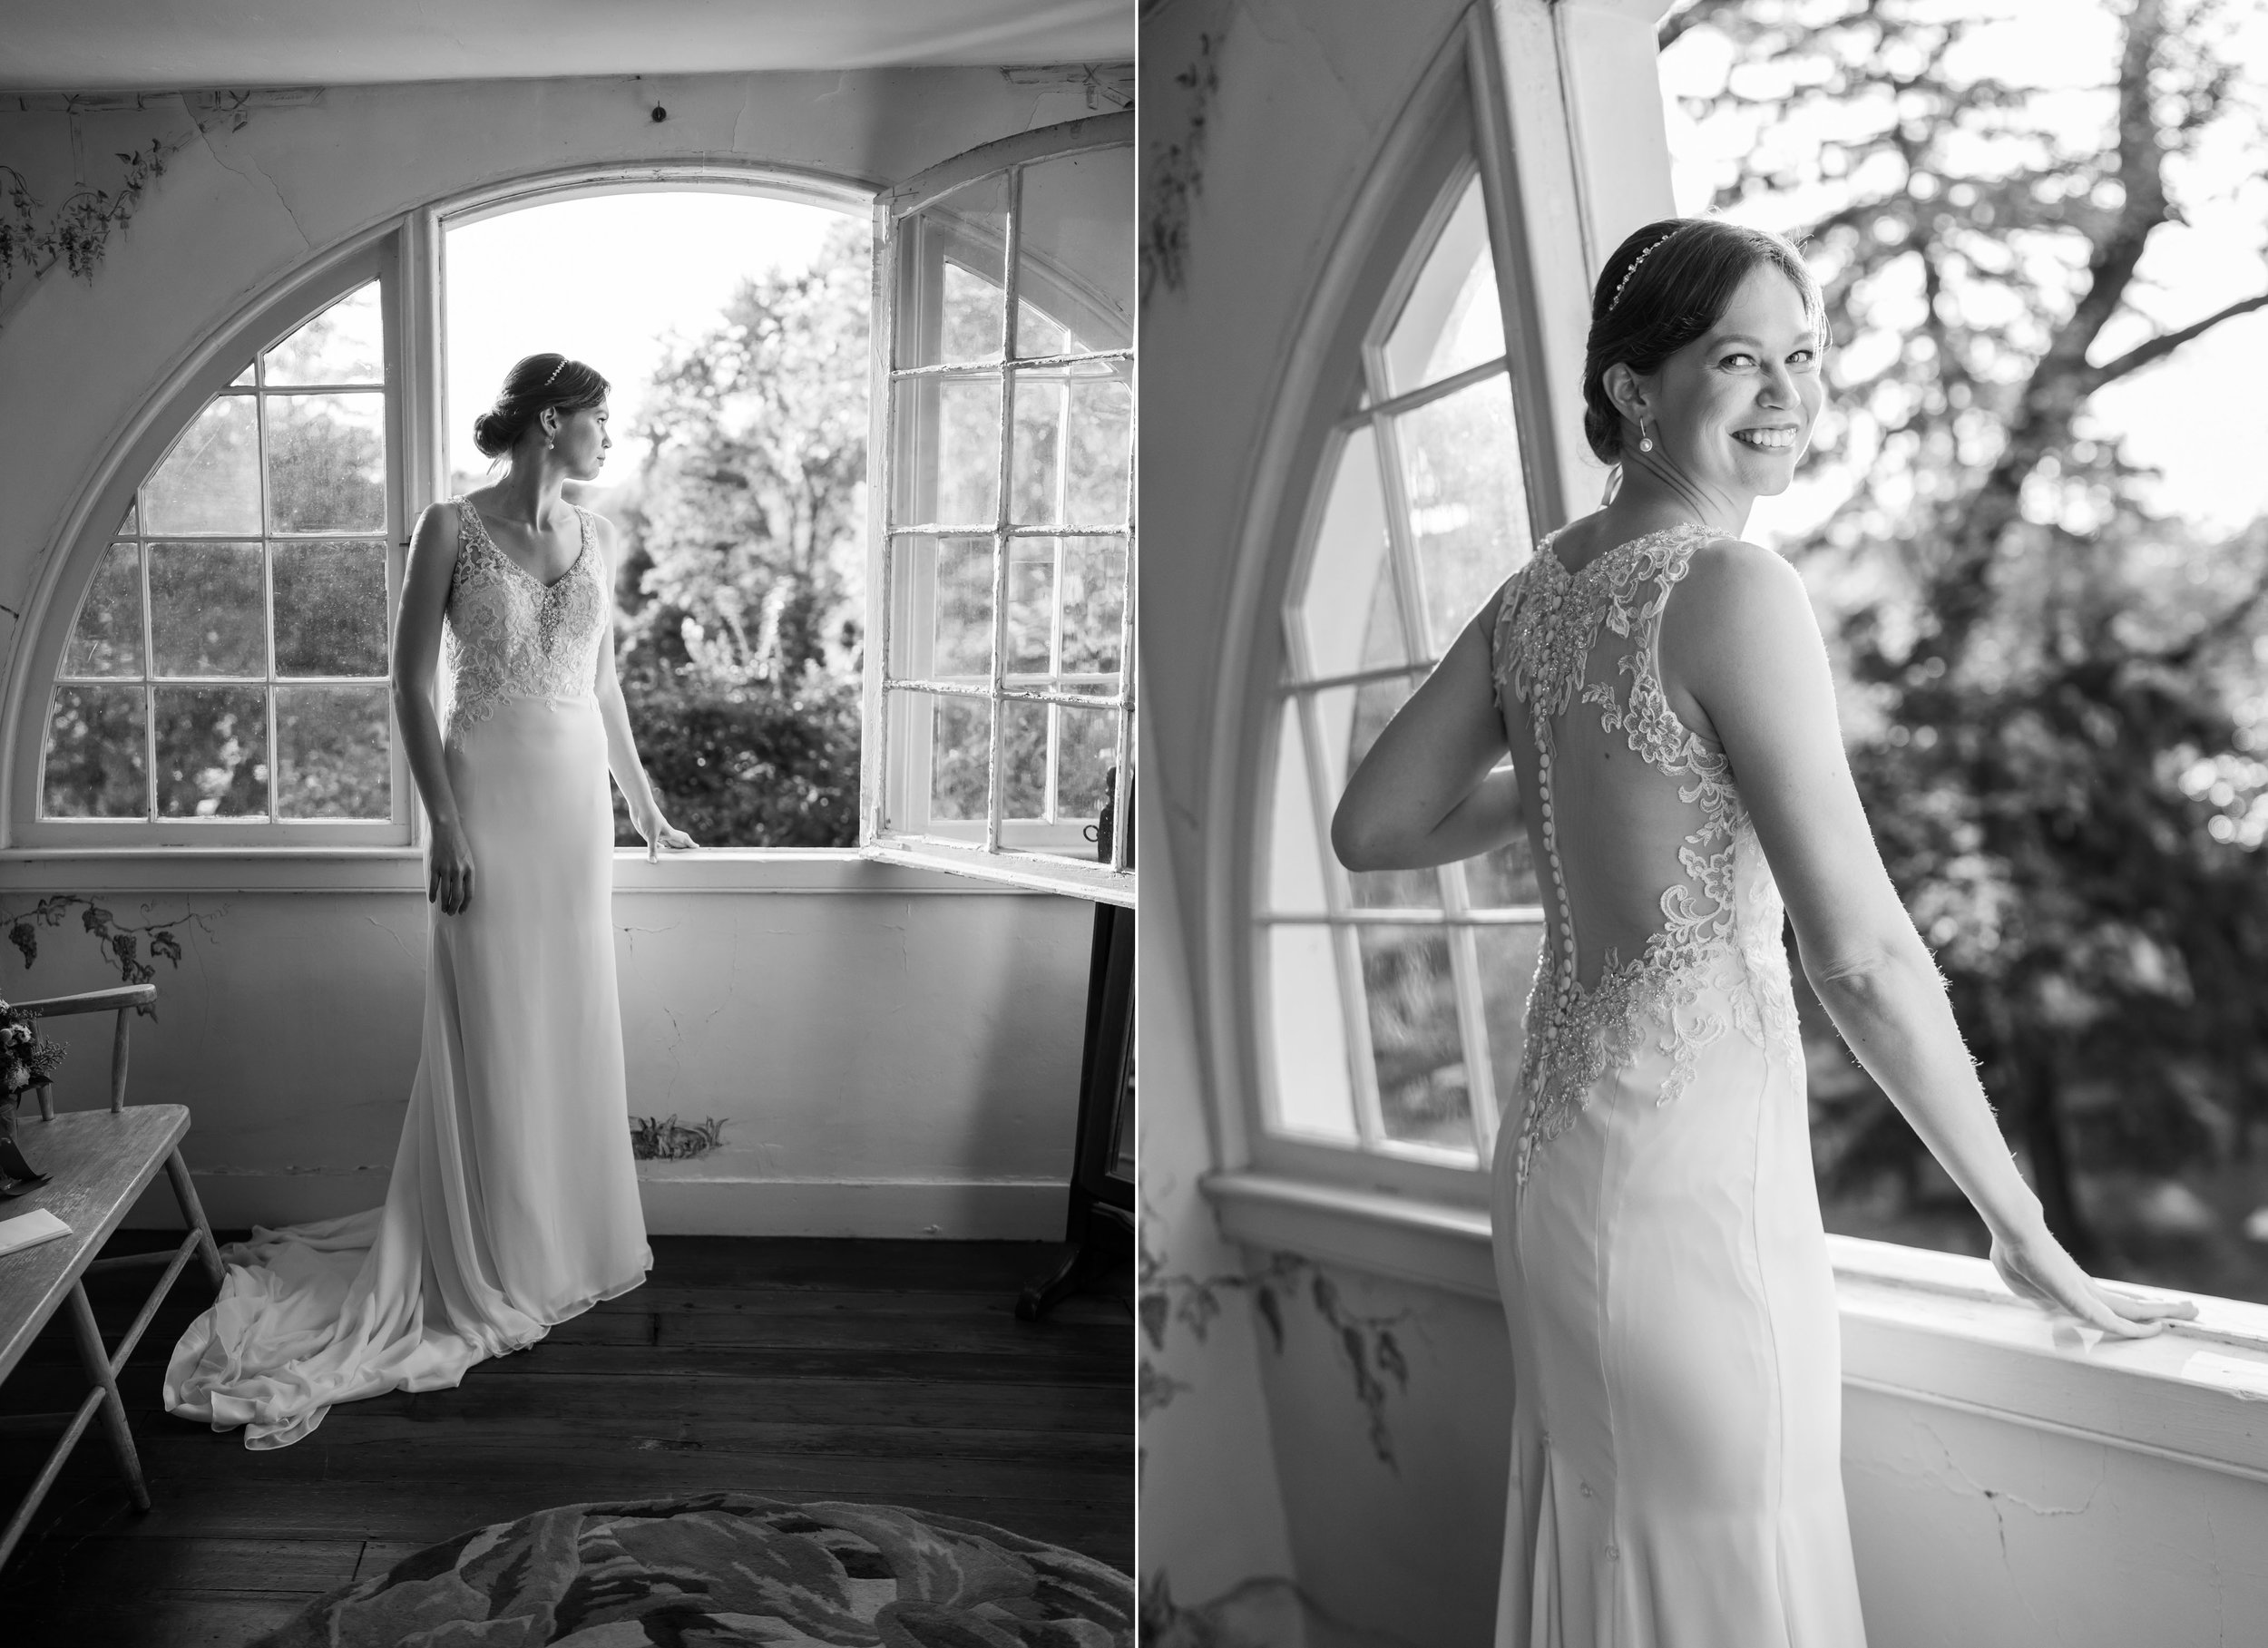 Bride in window at bridal suite at Elkridge Furnace Inn wedding photos